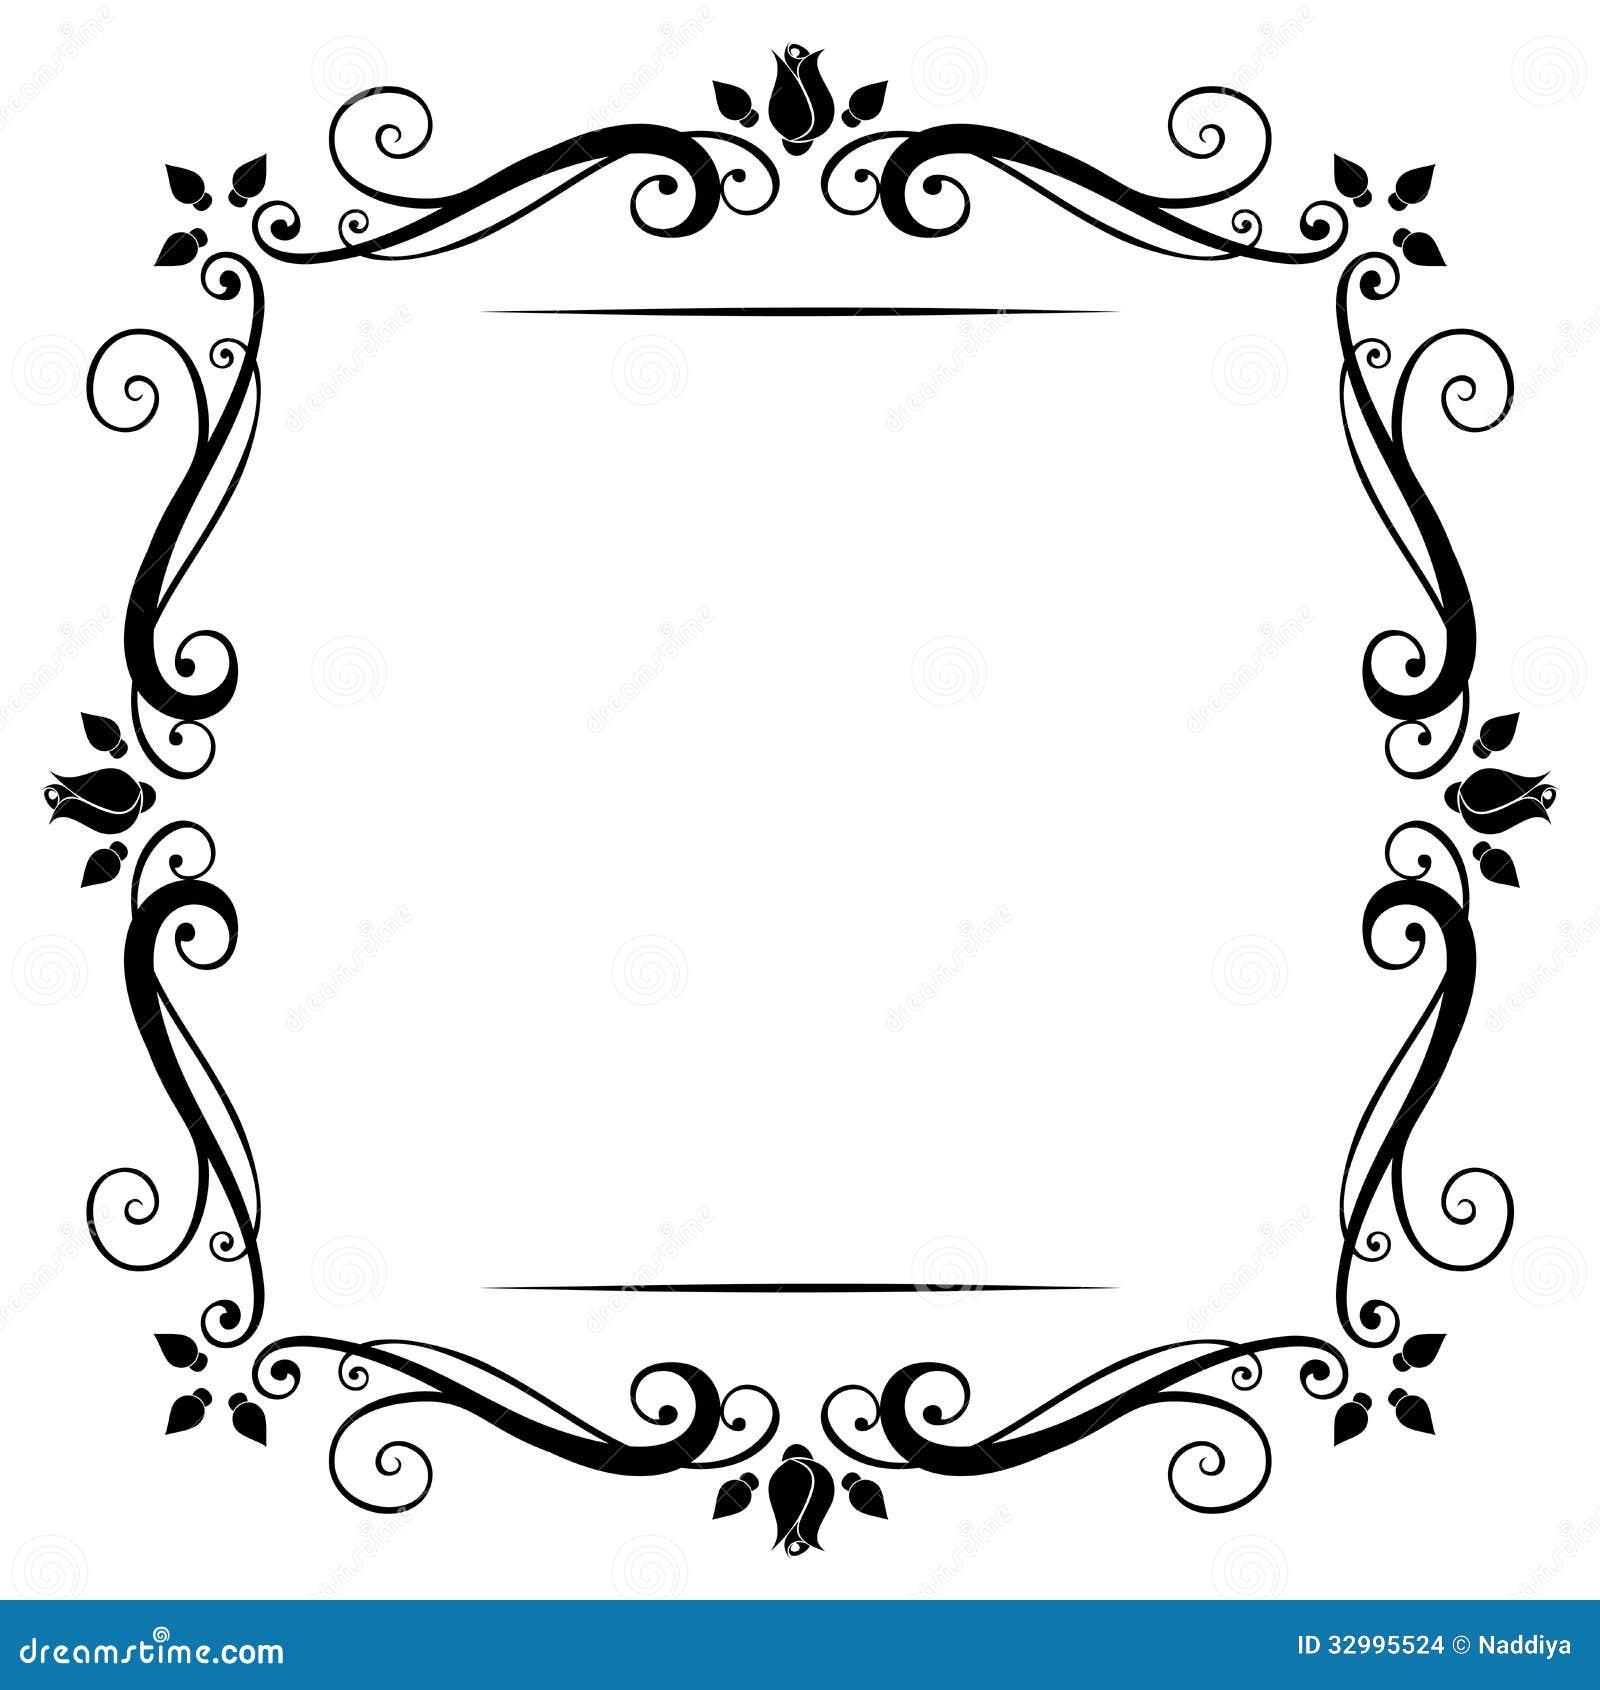 vintage frame stock vector illustration of nature flourish clip art png flourish clip art free download brown